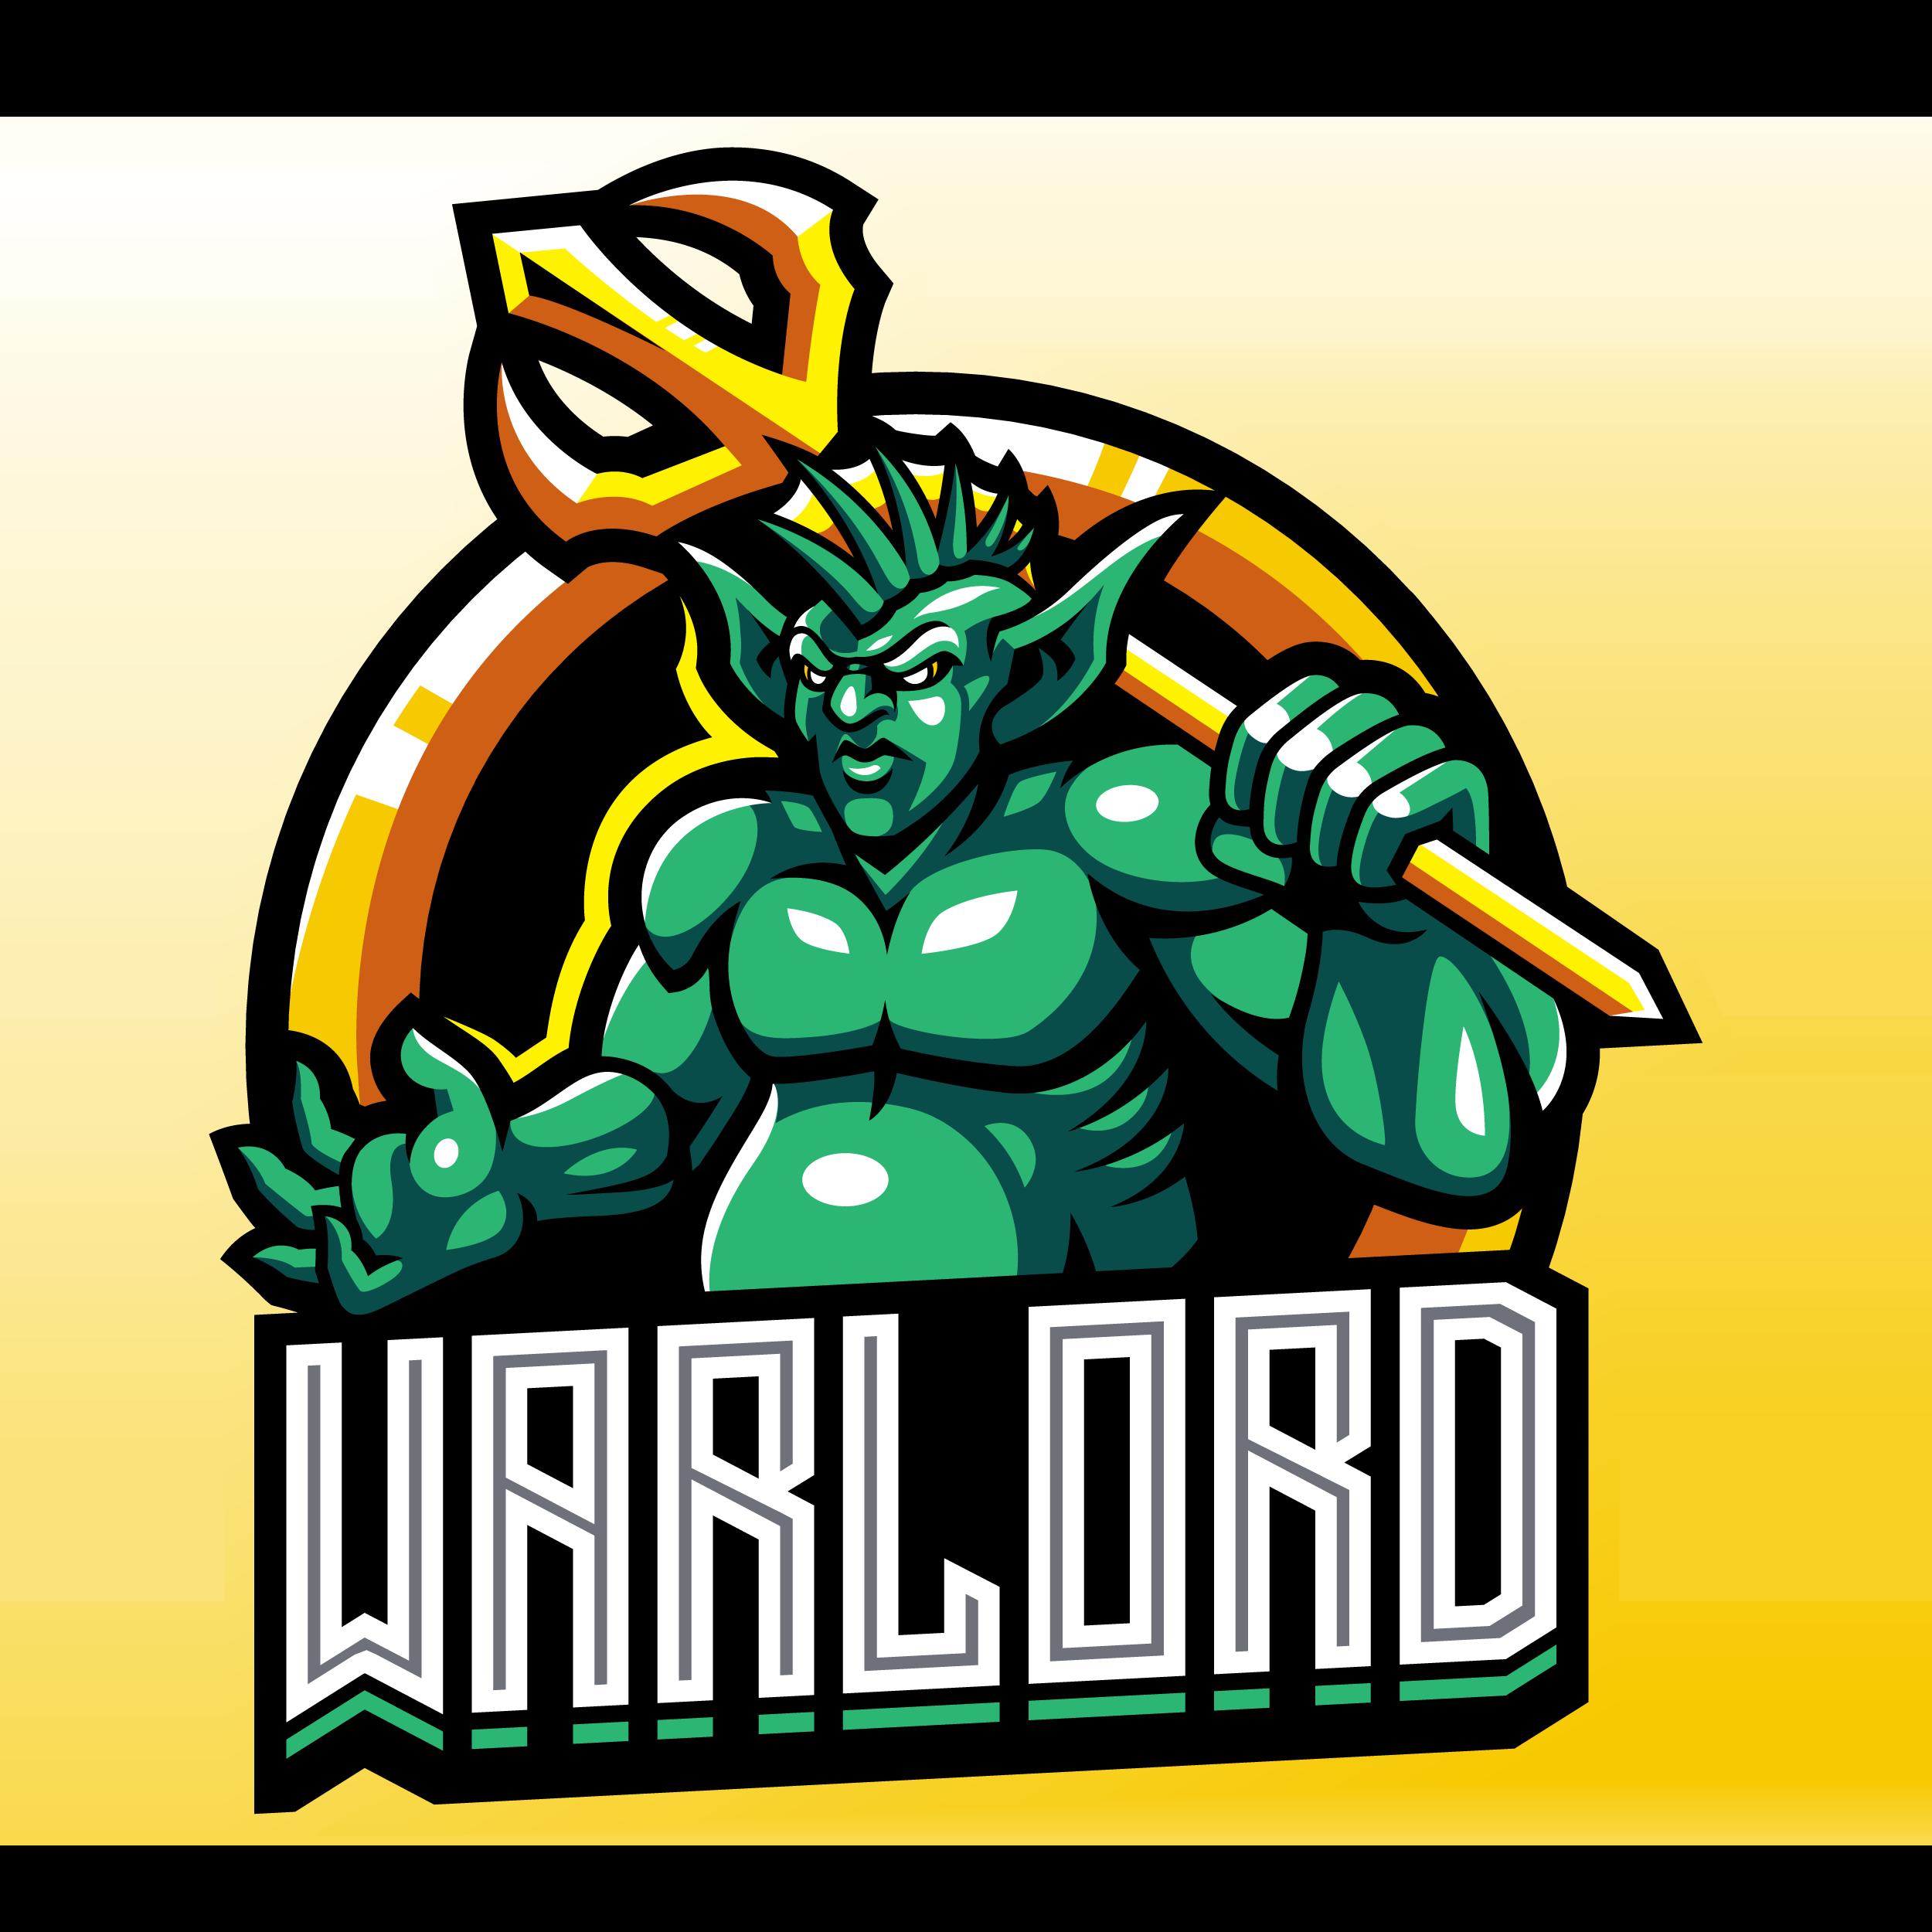 War-Lord-Esports-Mascot-Logo-Template-PNG-Transparent